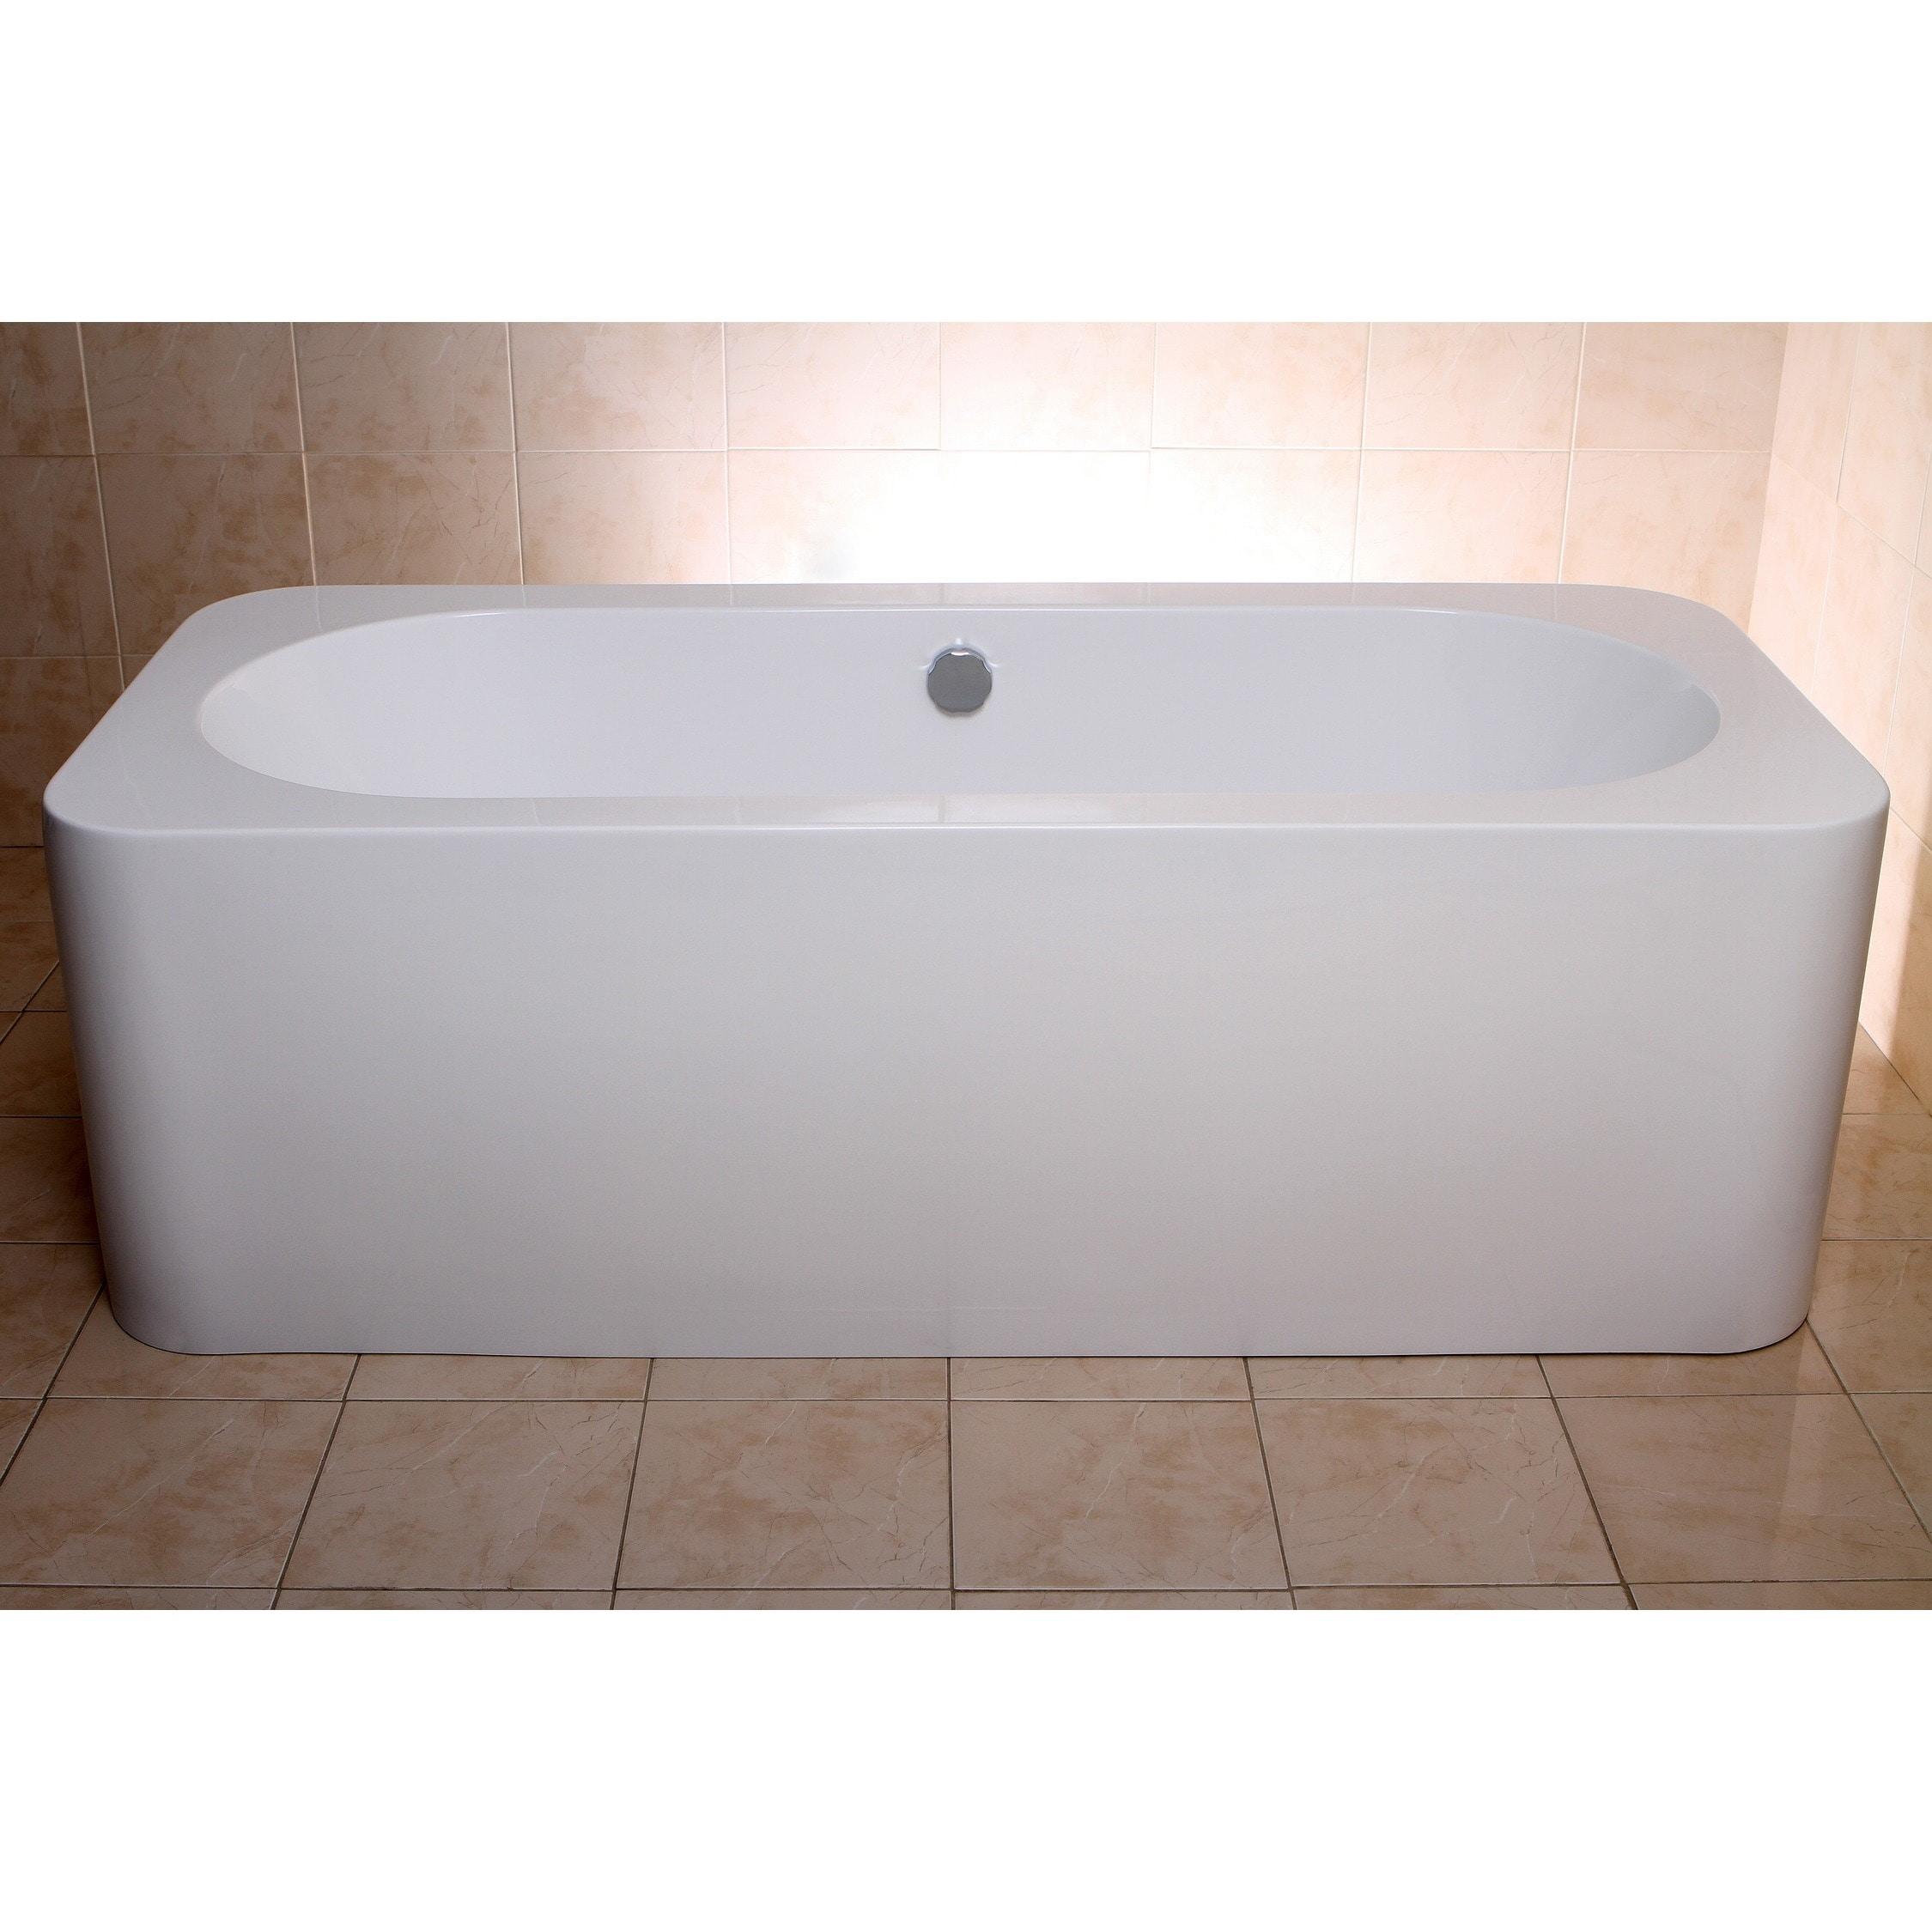 Shop Modern Rectangular 71-inch Freestanding Acrylic Bathtub - Free ...